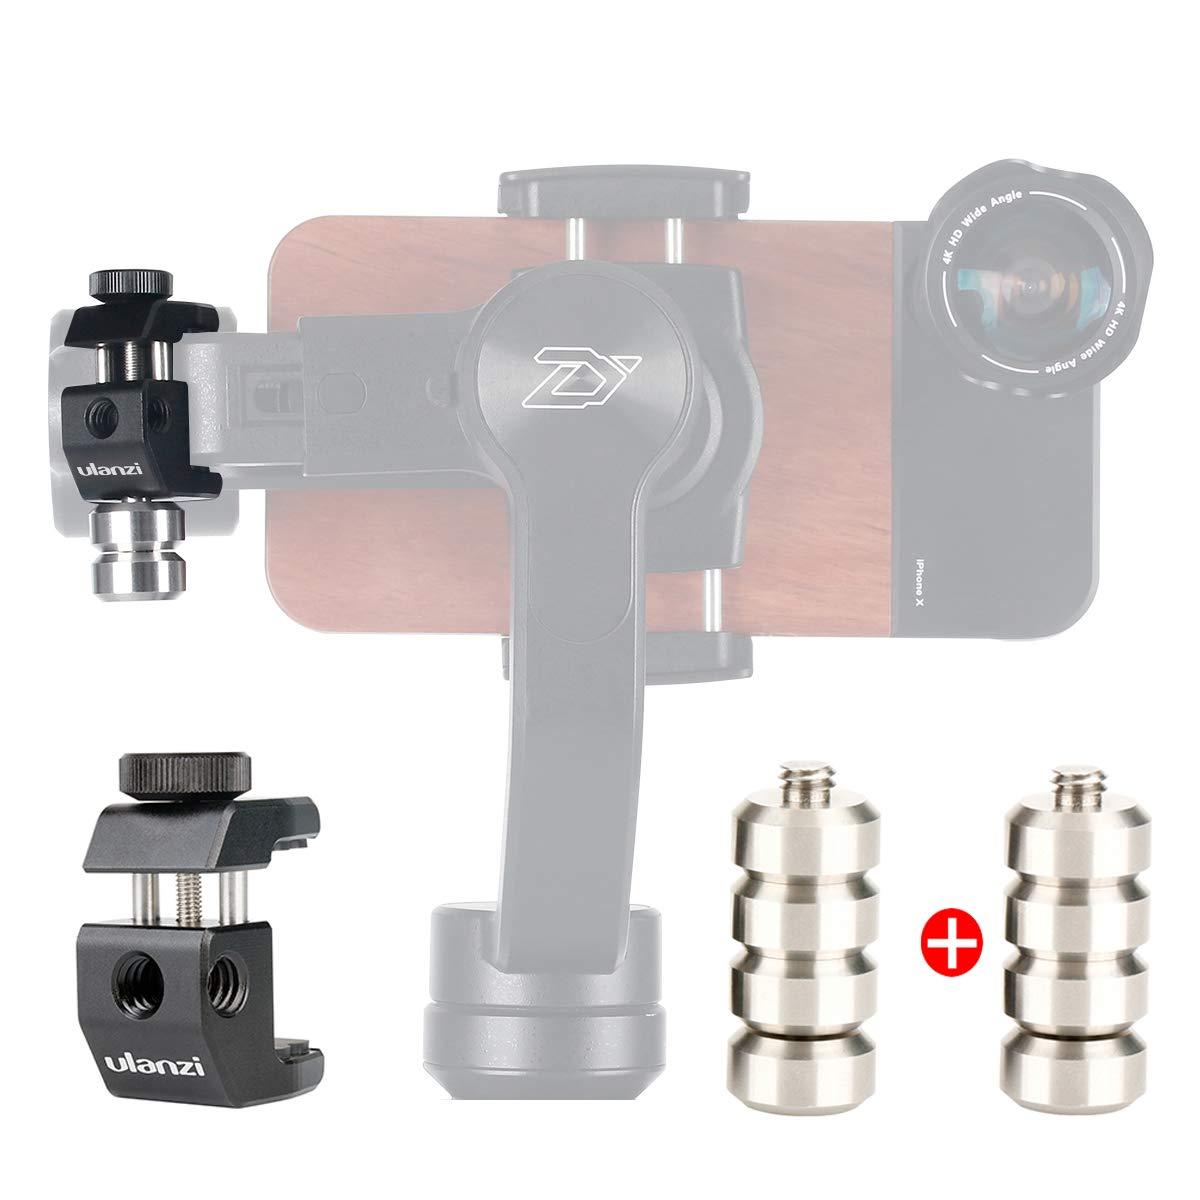 Universal 100g Gimbal Counterweight for Balancing Moment Lens/Phone Case Cover for Zhiyun Smooth 4 DJI Osmo Mobile 2/Osmo Mobile 3 Moza Mini-mi Feiyutech Vimble 2